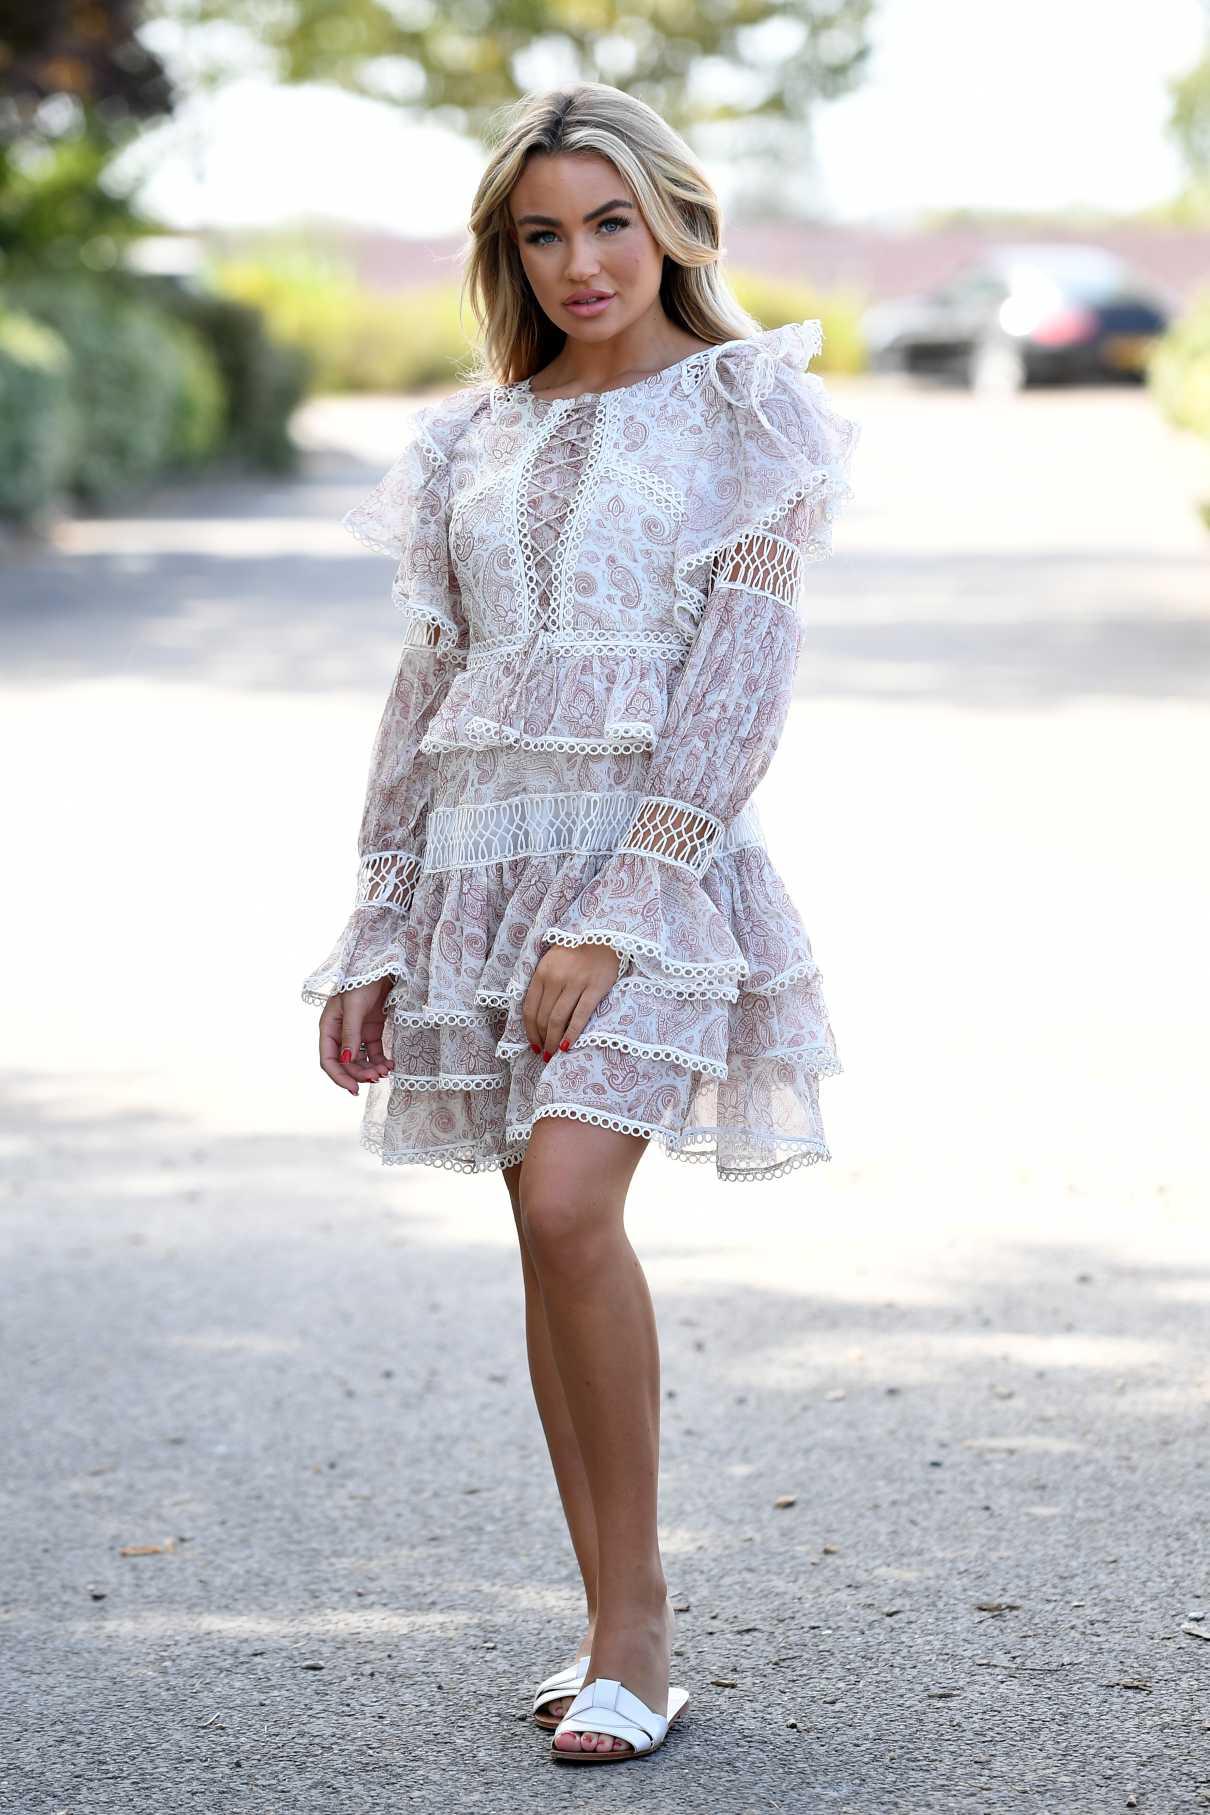 Ella Rae Wise in a White Dress